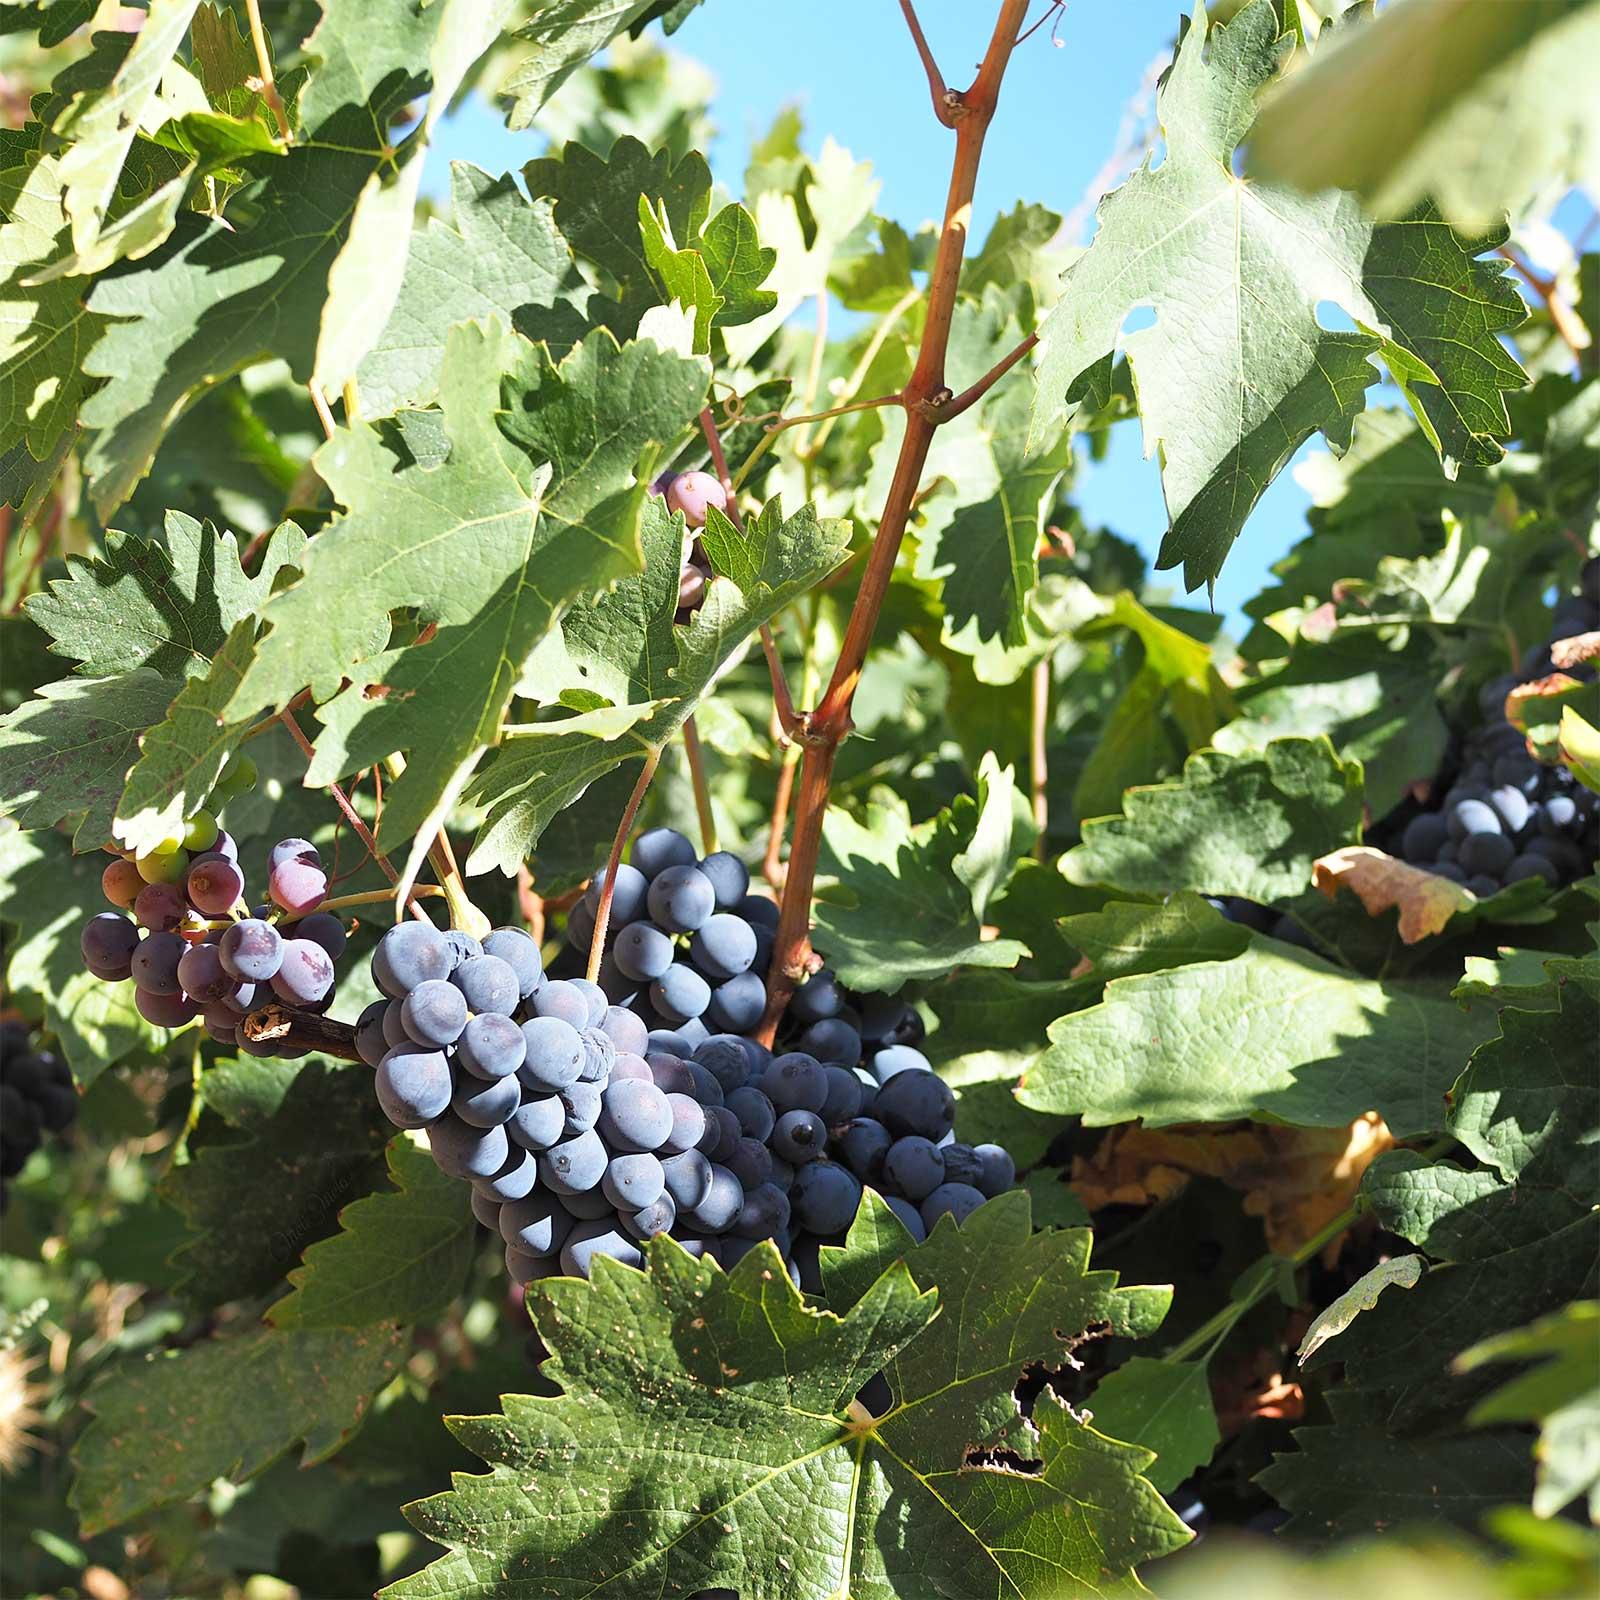 à velo été indien raisin uvas Cigales Valladolid septiembre octubre en bici yoniquenews